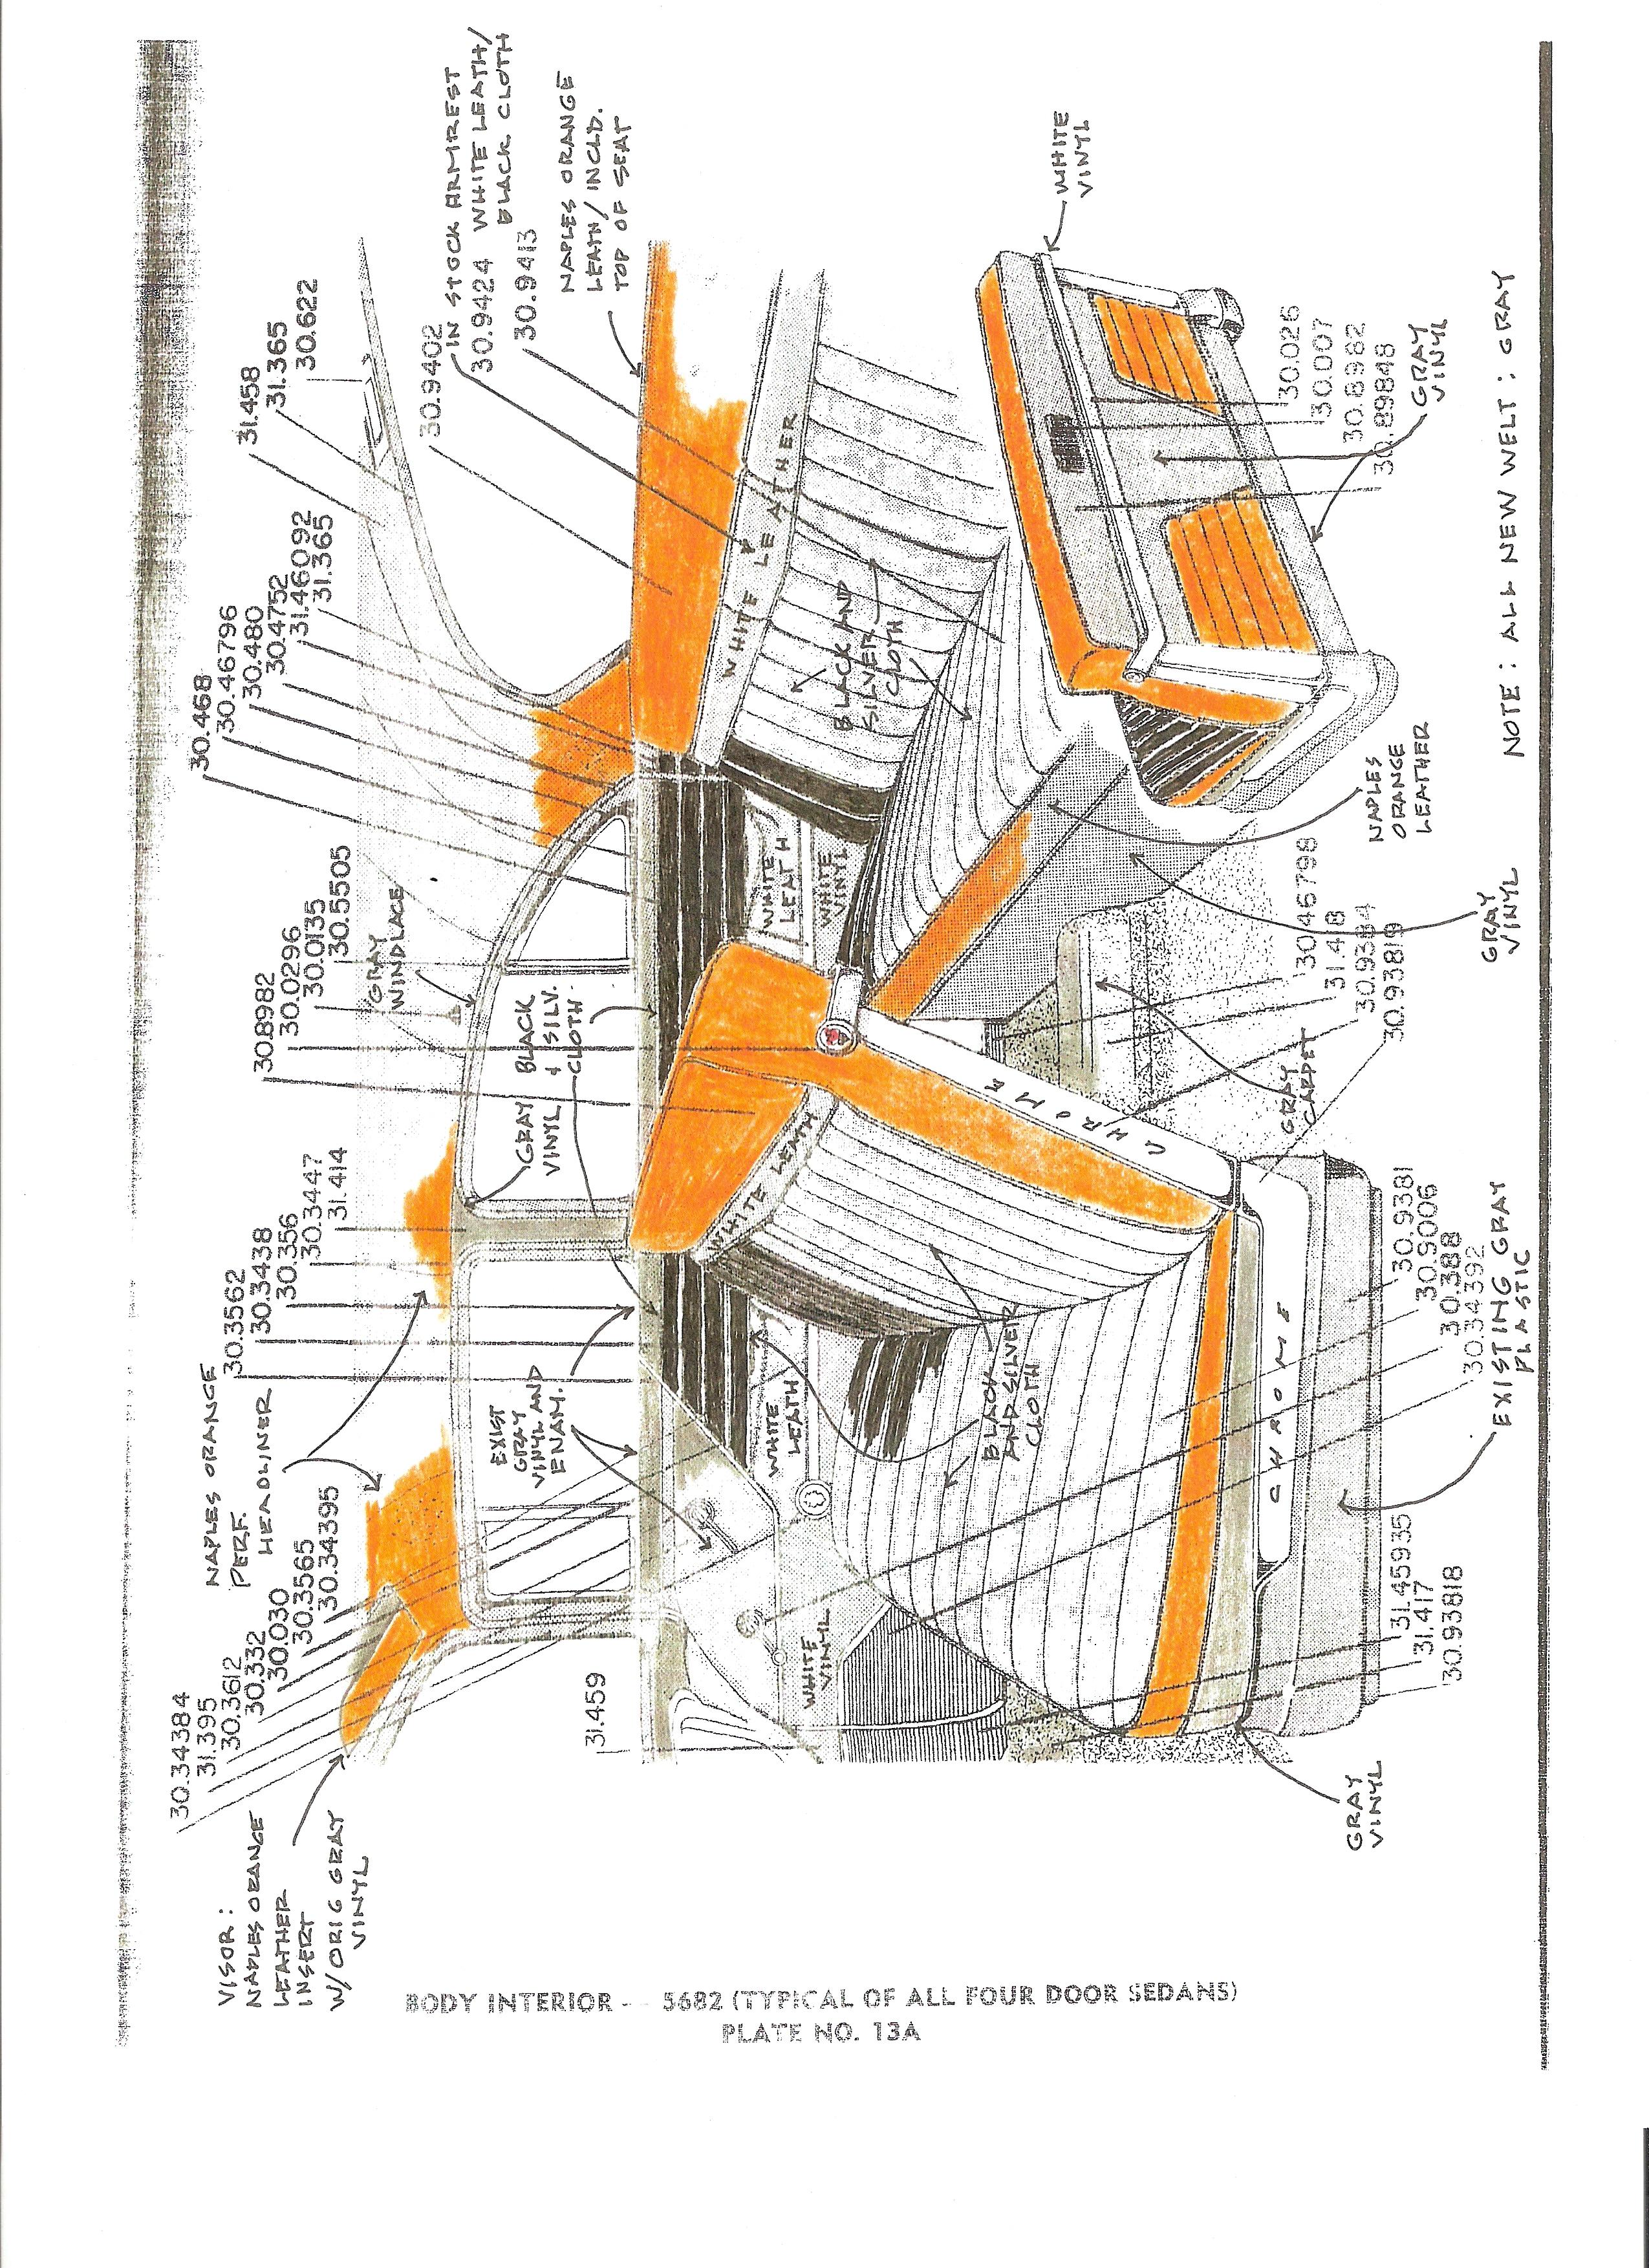 Msd 8861 Wiring Diagram Hei Trusted Wiring Diagrams MSD 3 Step Wiring- Diagram Msd 8861 Wiring Diagram Hei